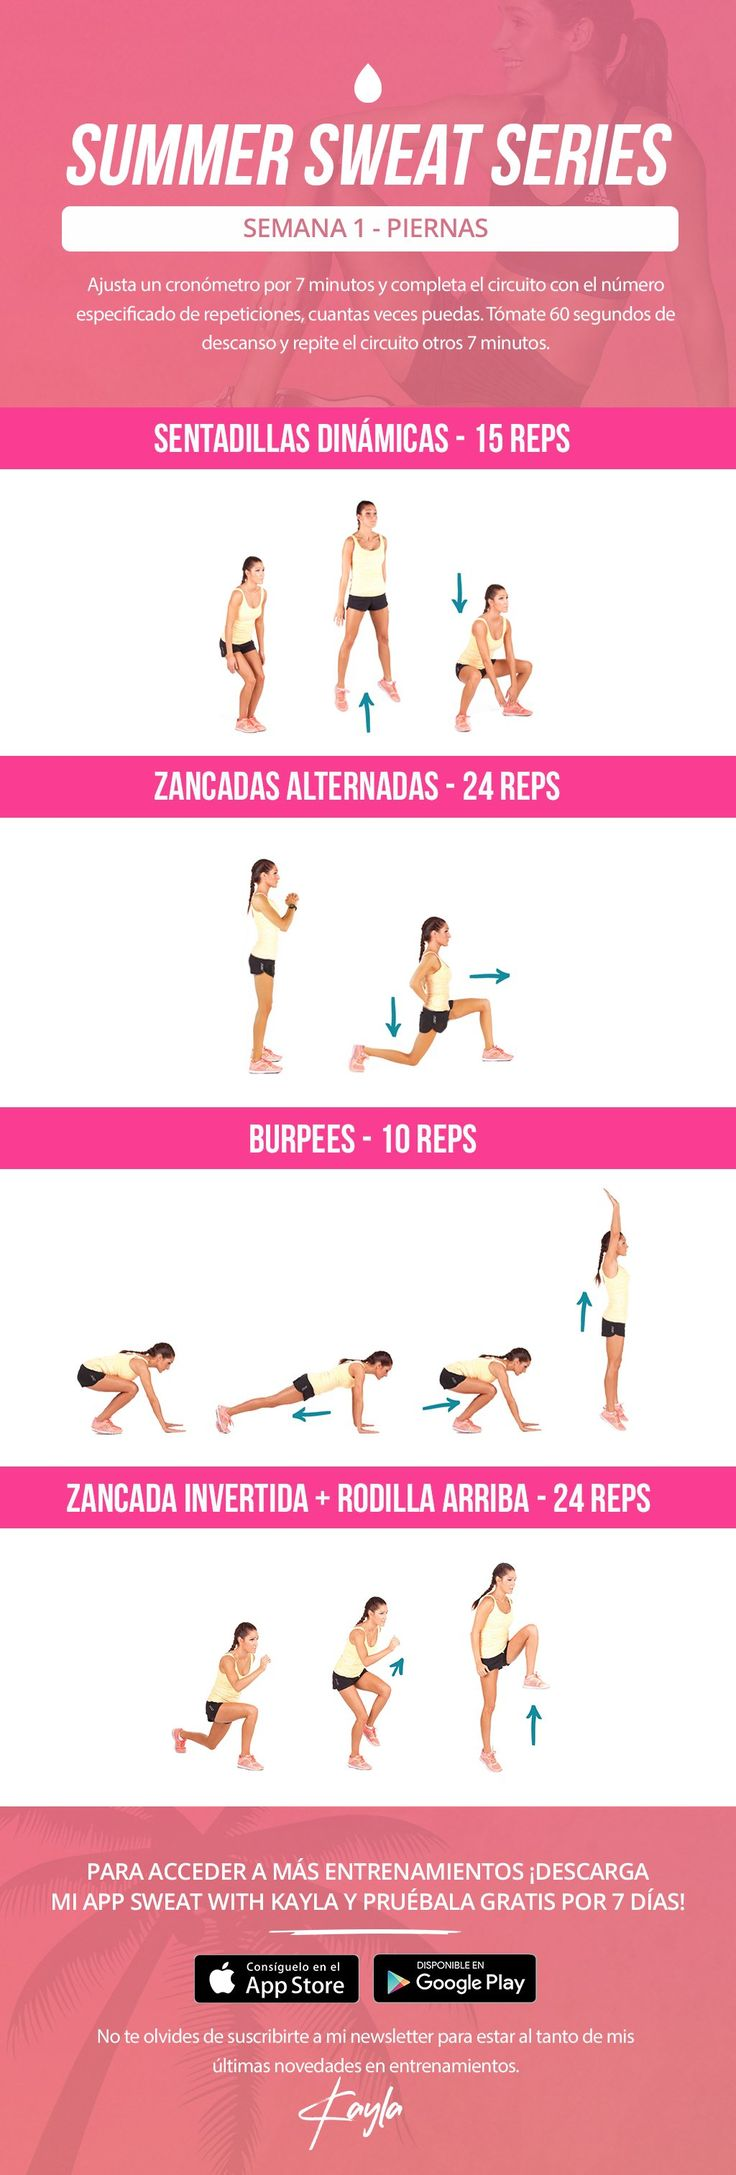 Summer Sweat Series - Semana 1 Lunes – Kayla Itsines